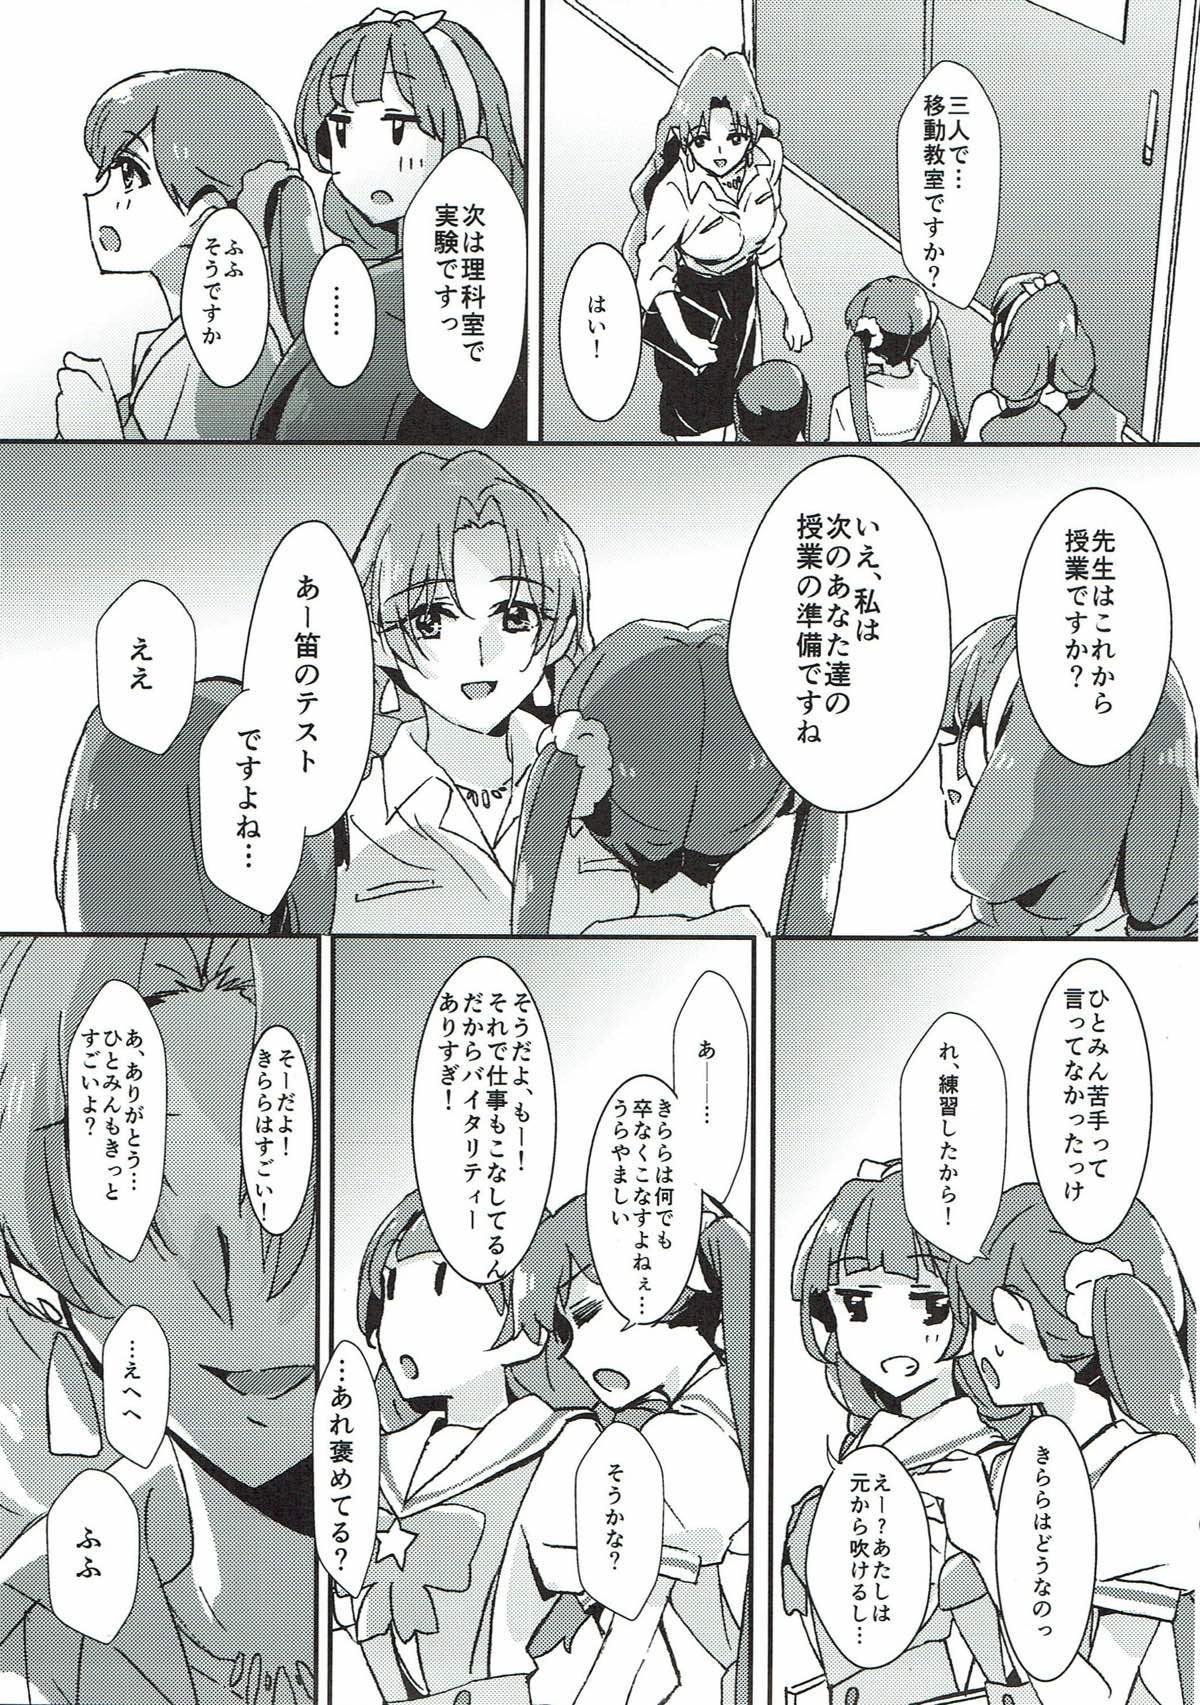 Sensei to Atashi 7